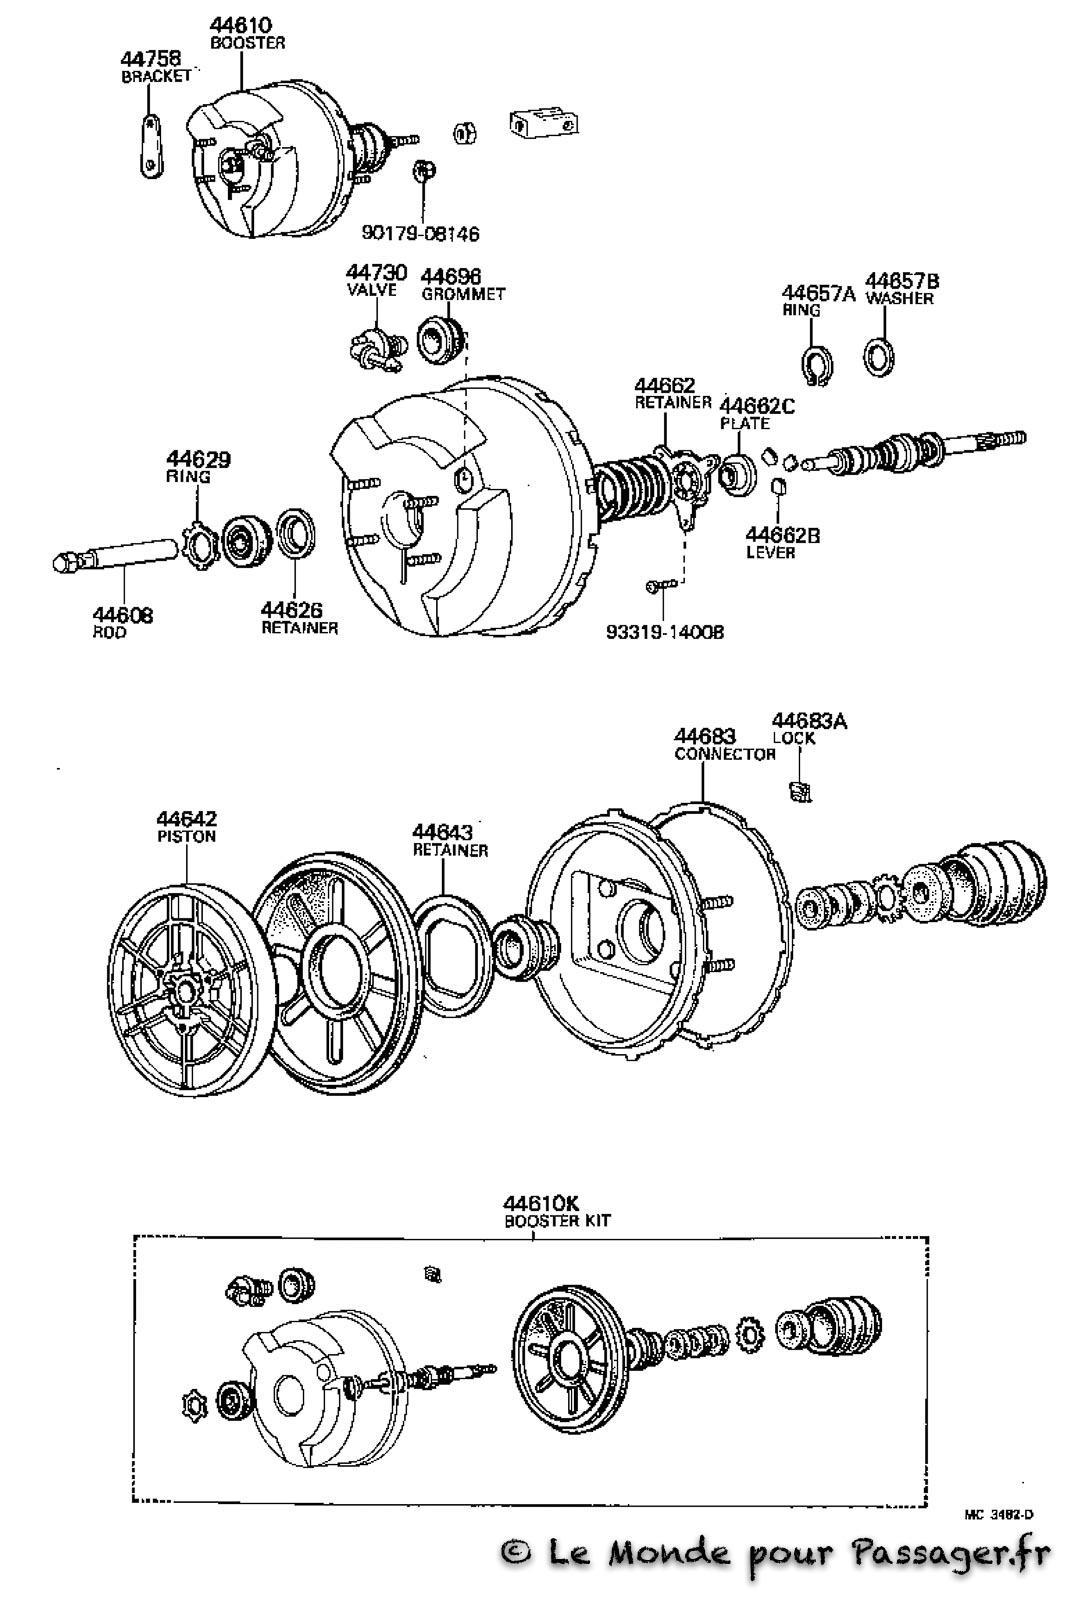 Fj55-Eclatés-Techniques151